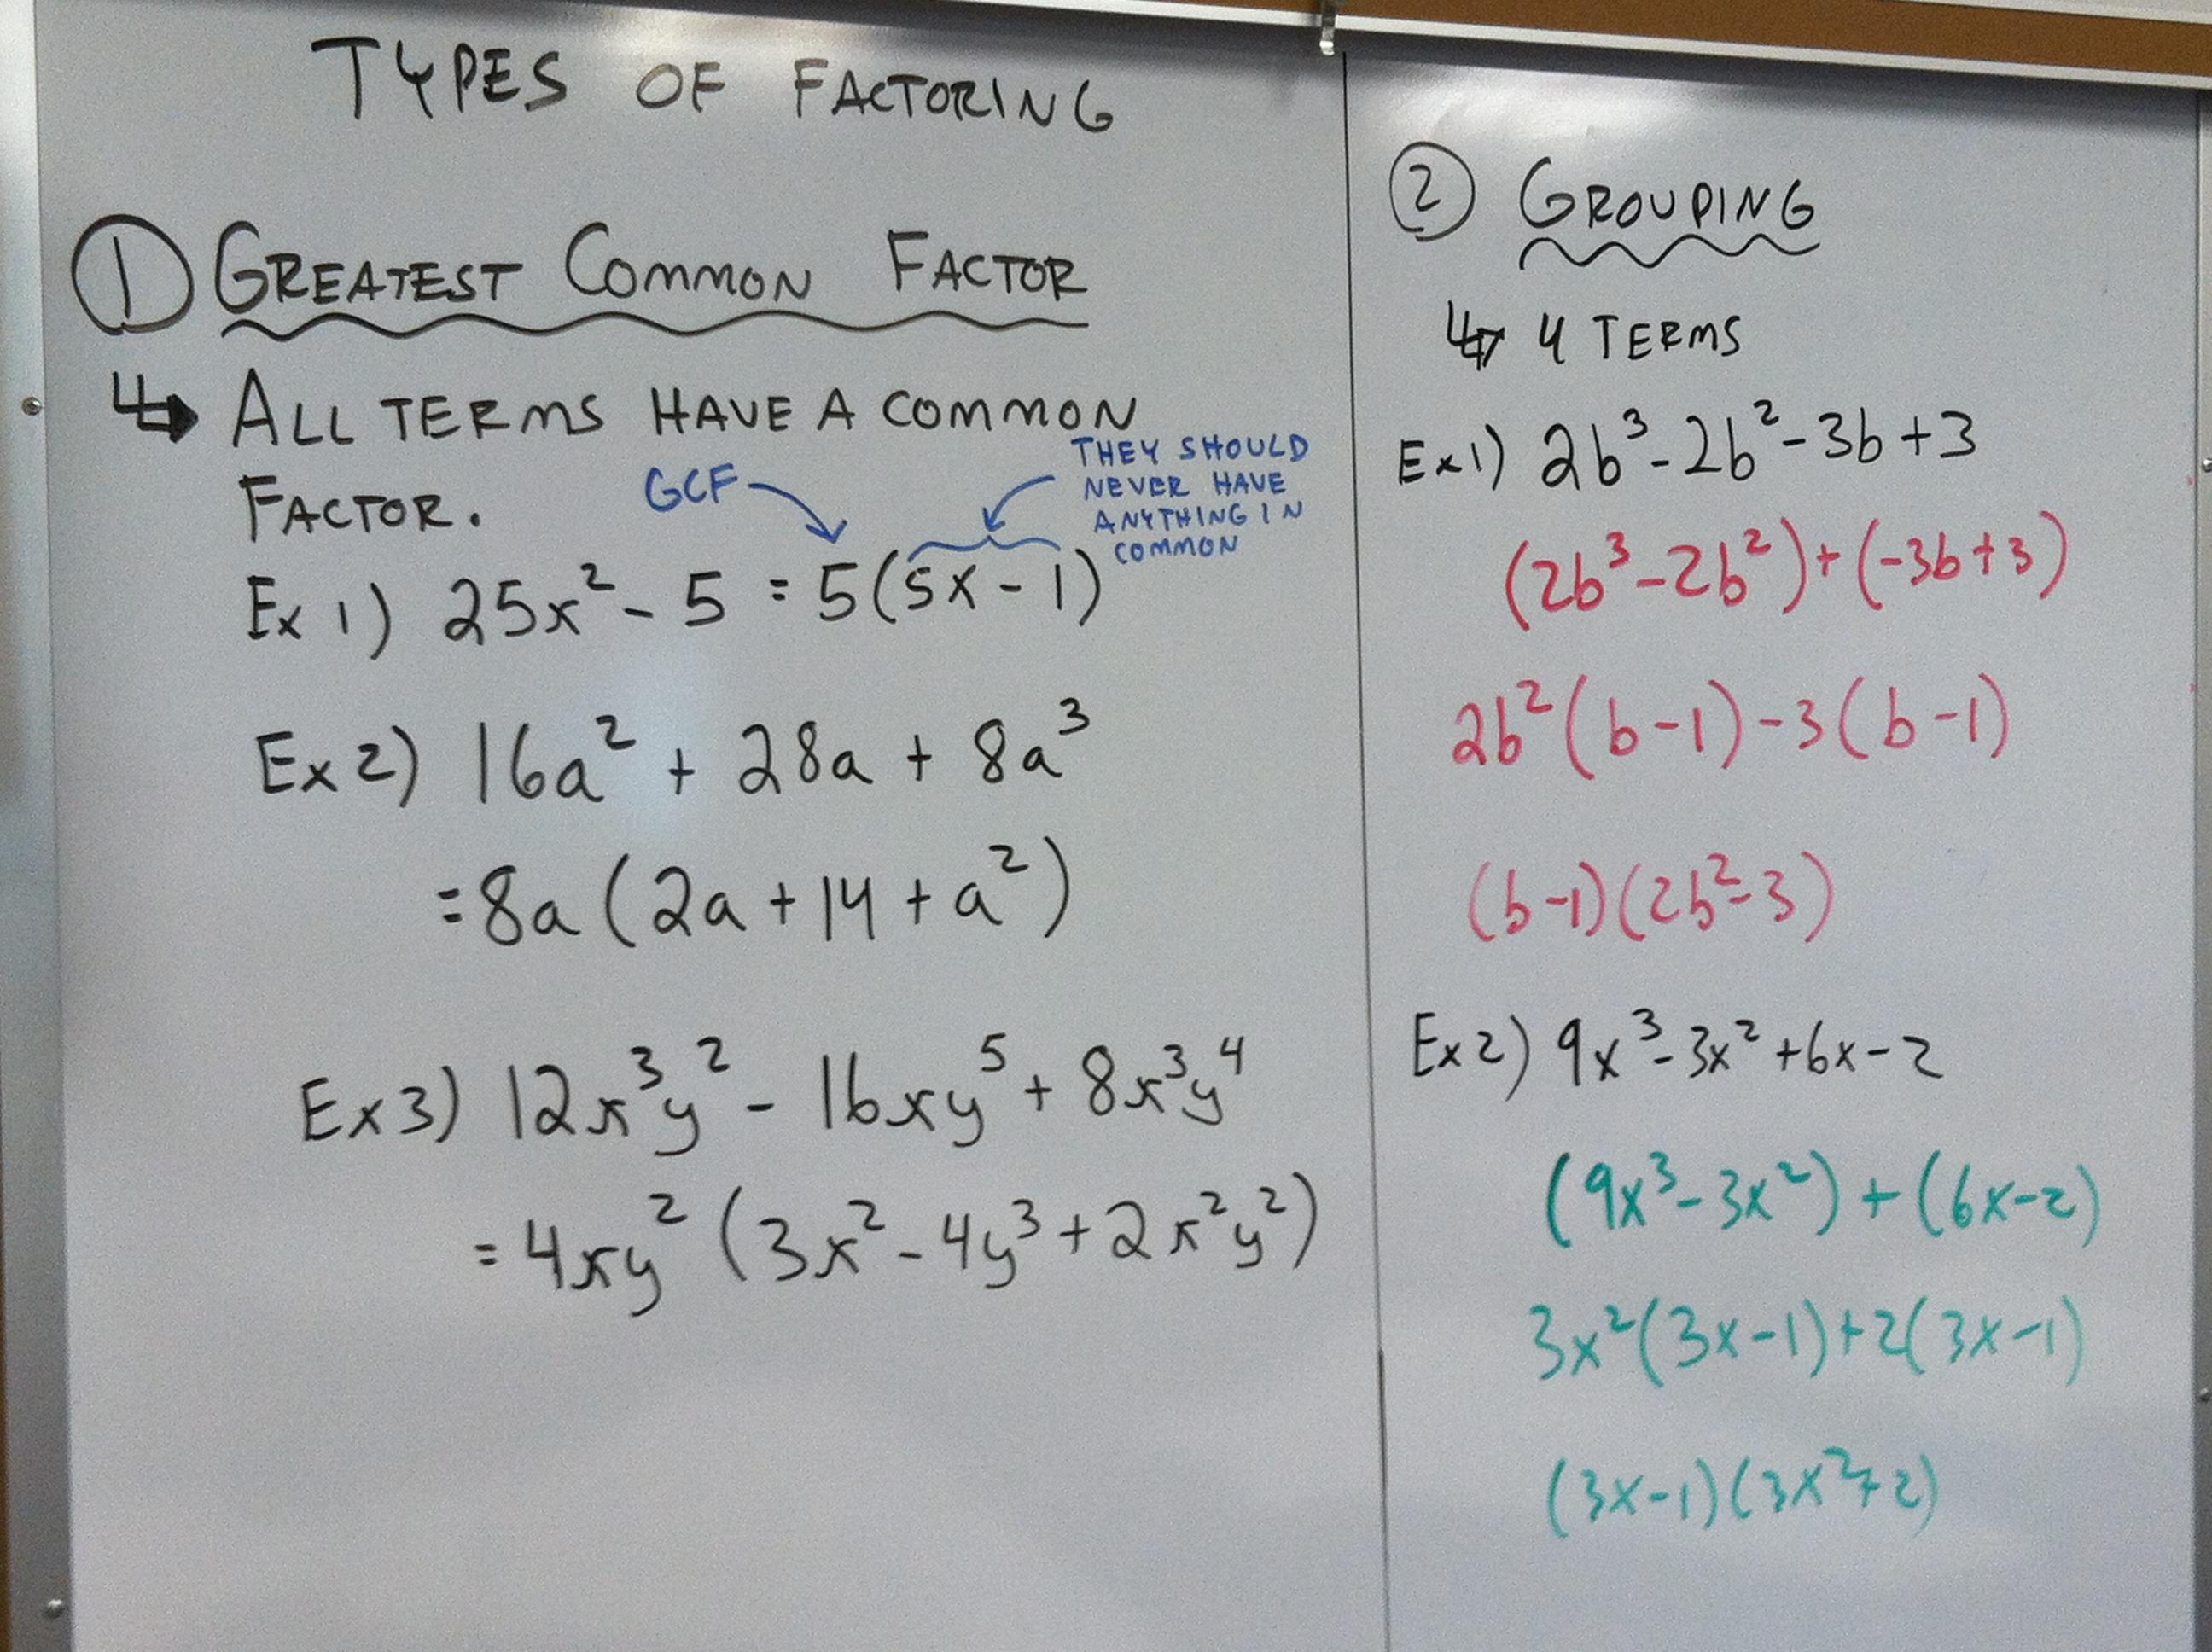 Worksheet Factoring Gcf And Grouping